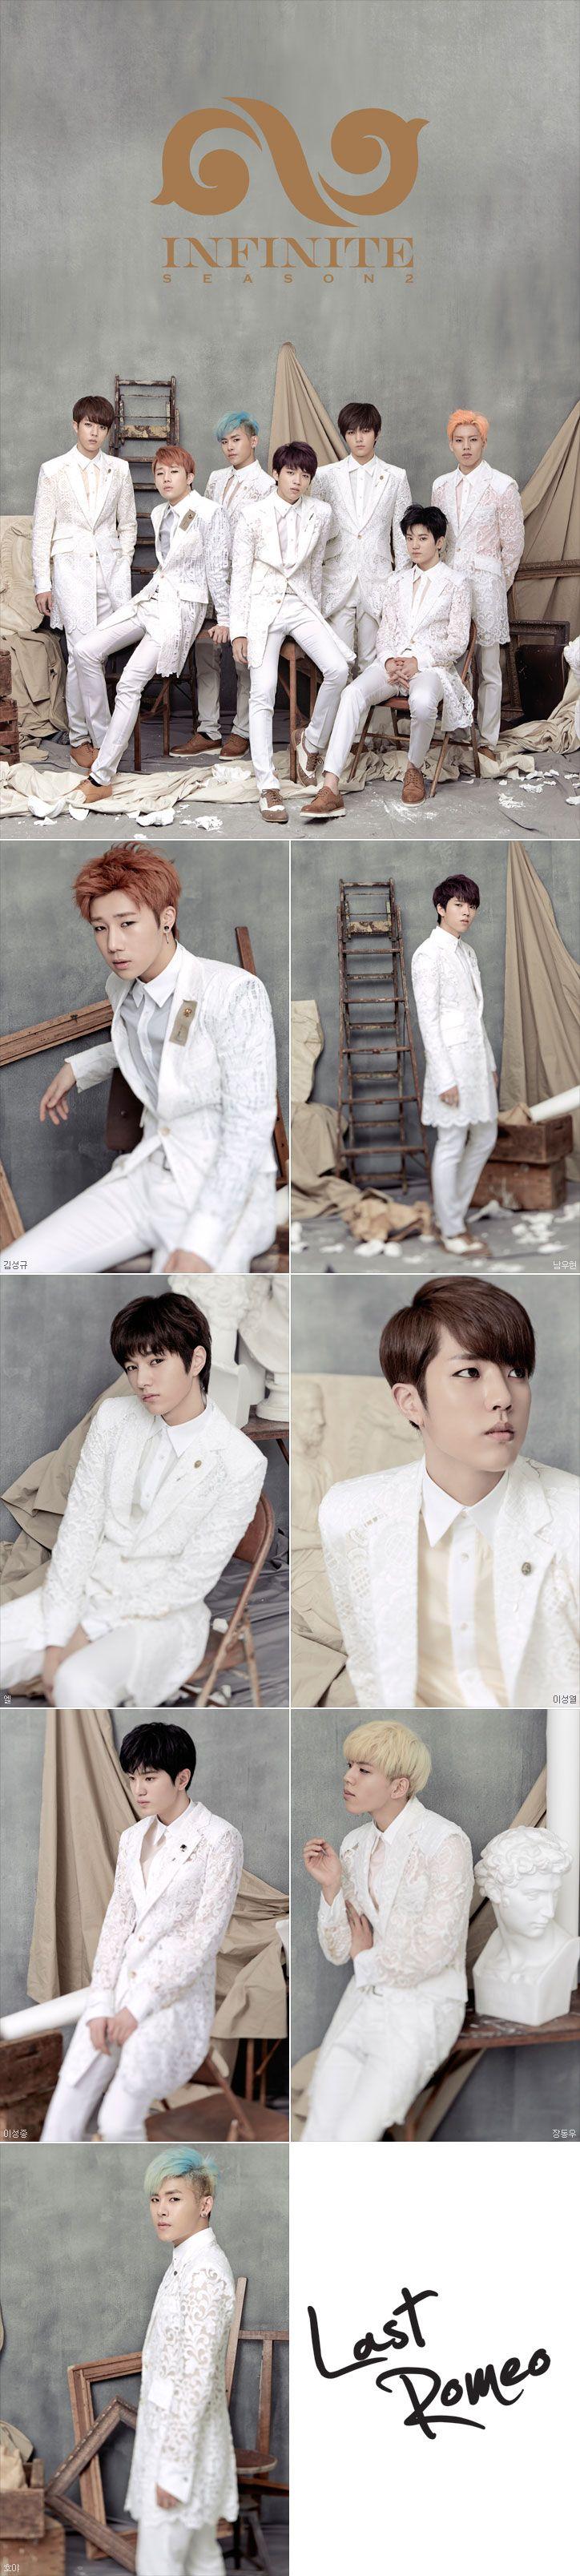 Infinite's Last Romeo